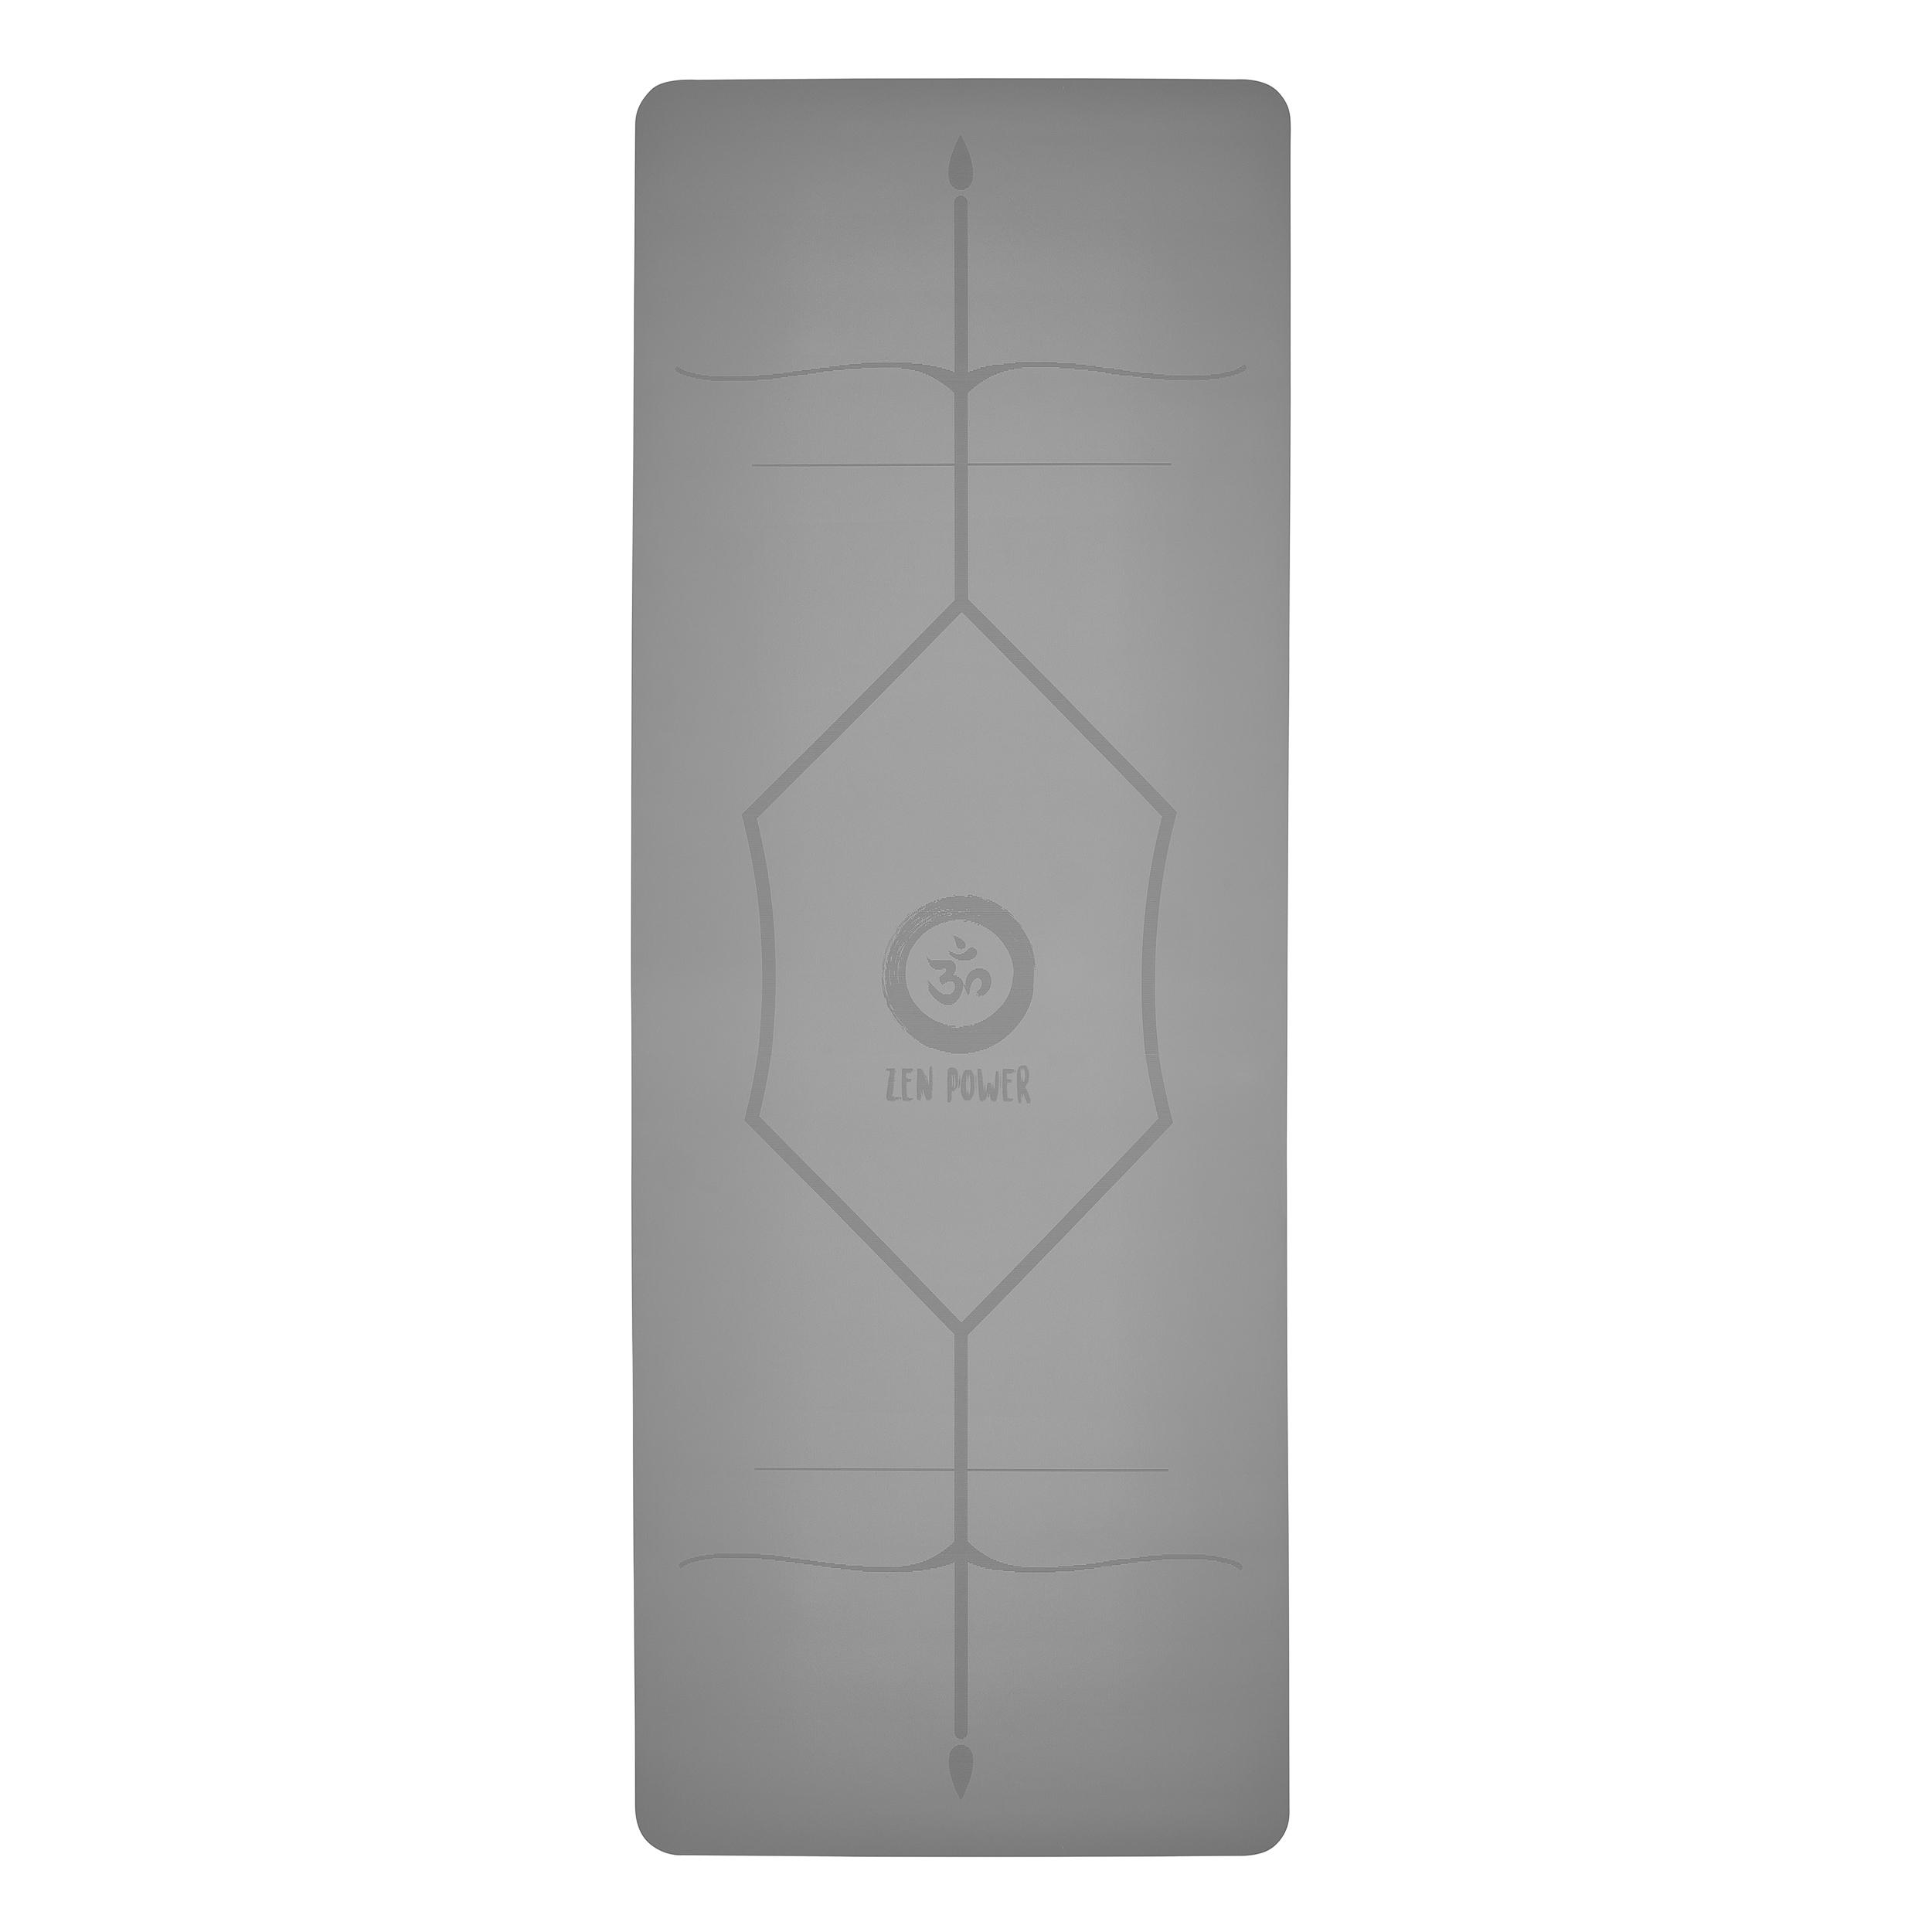 ZenPower Yogamatte Mandala - Hellgrau